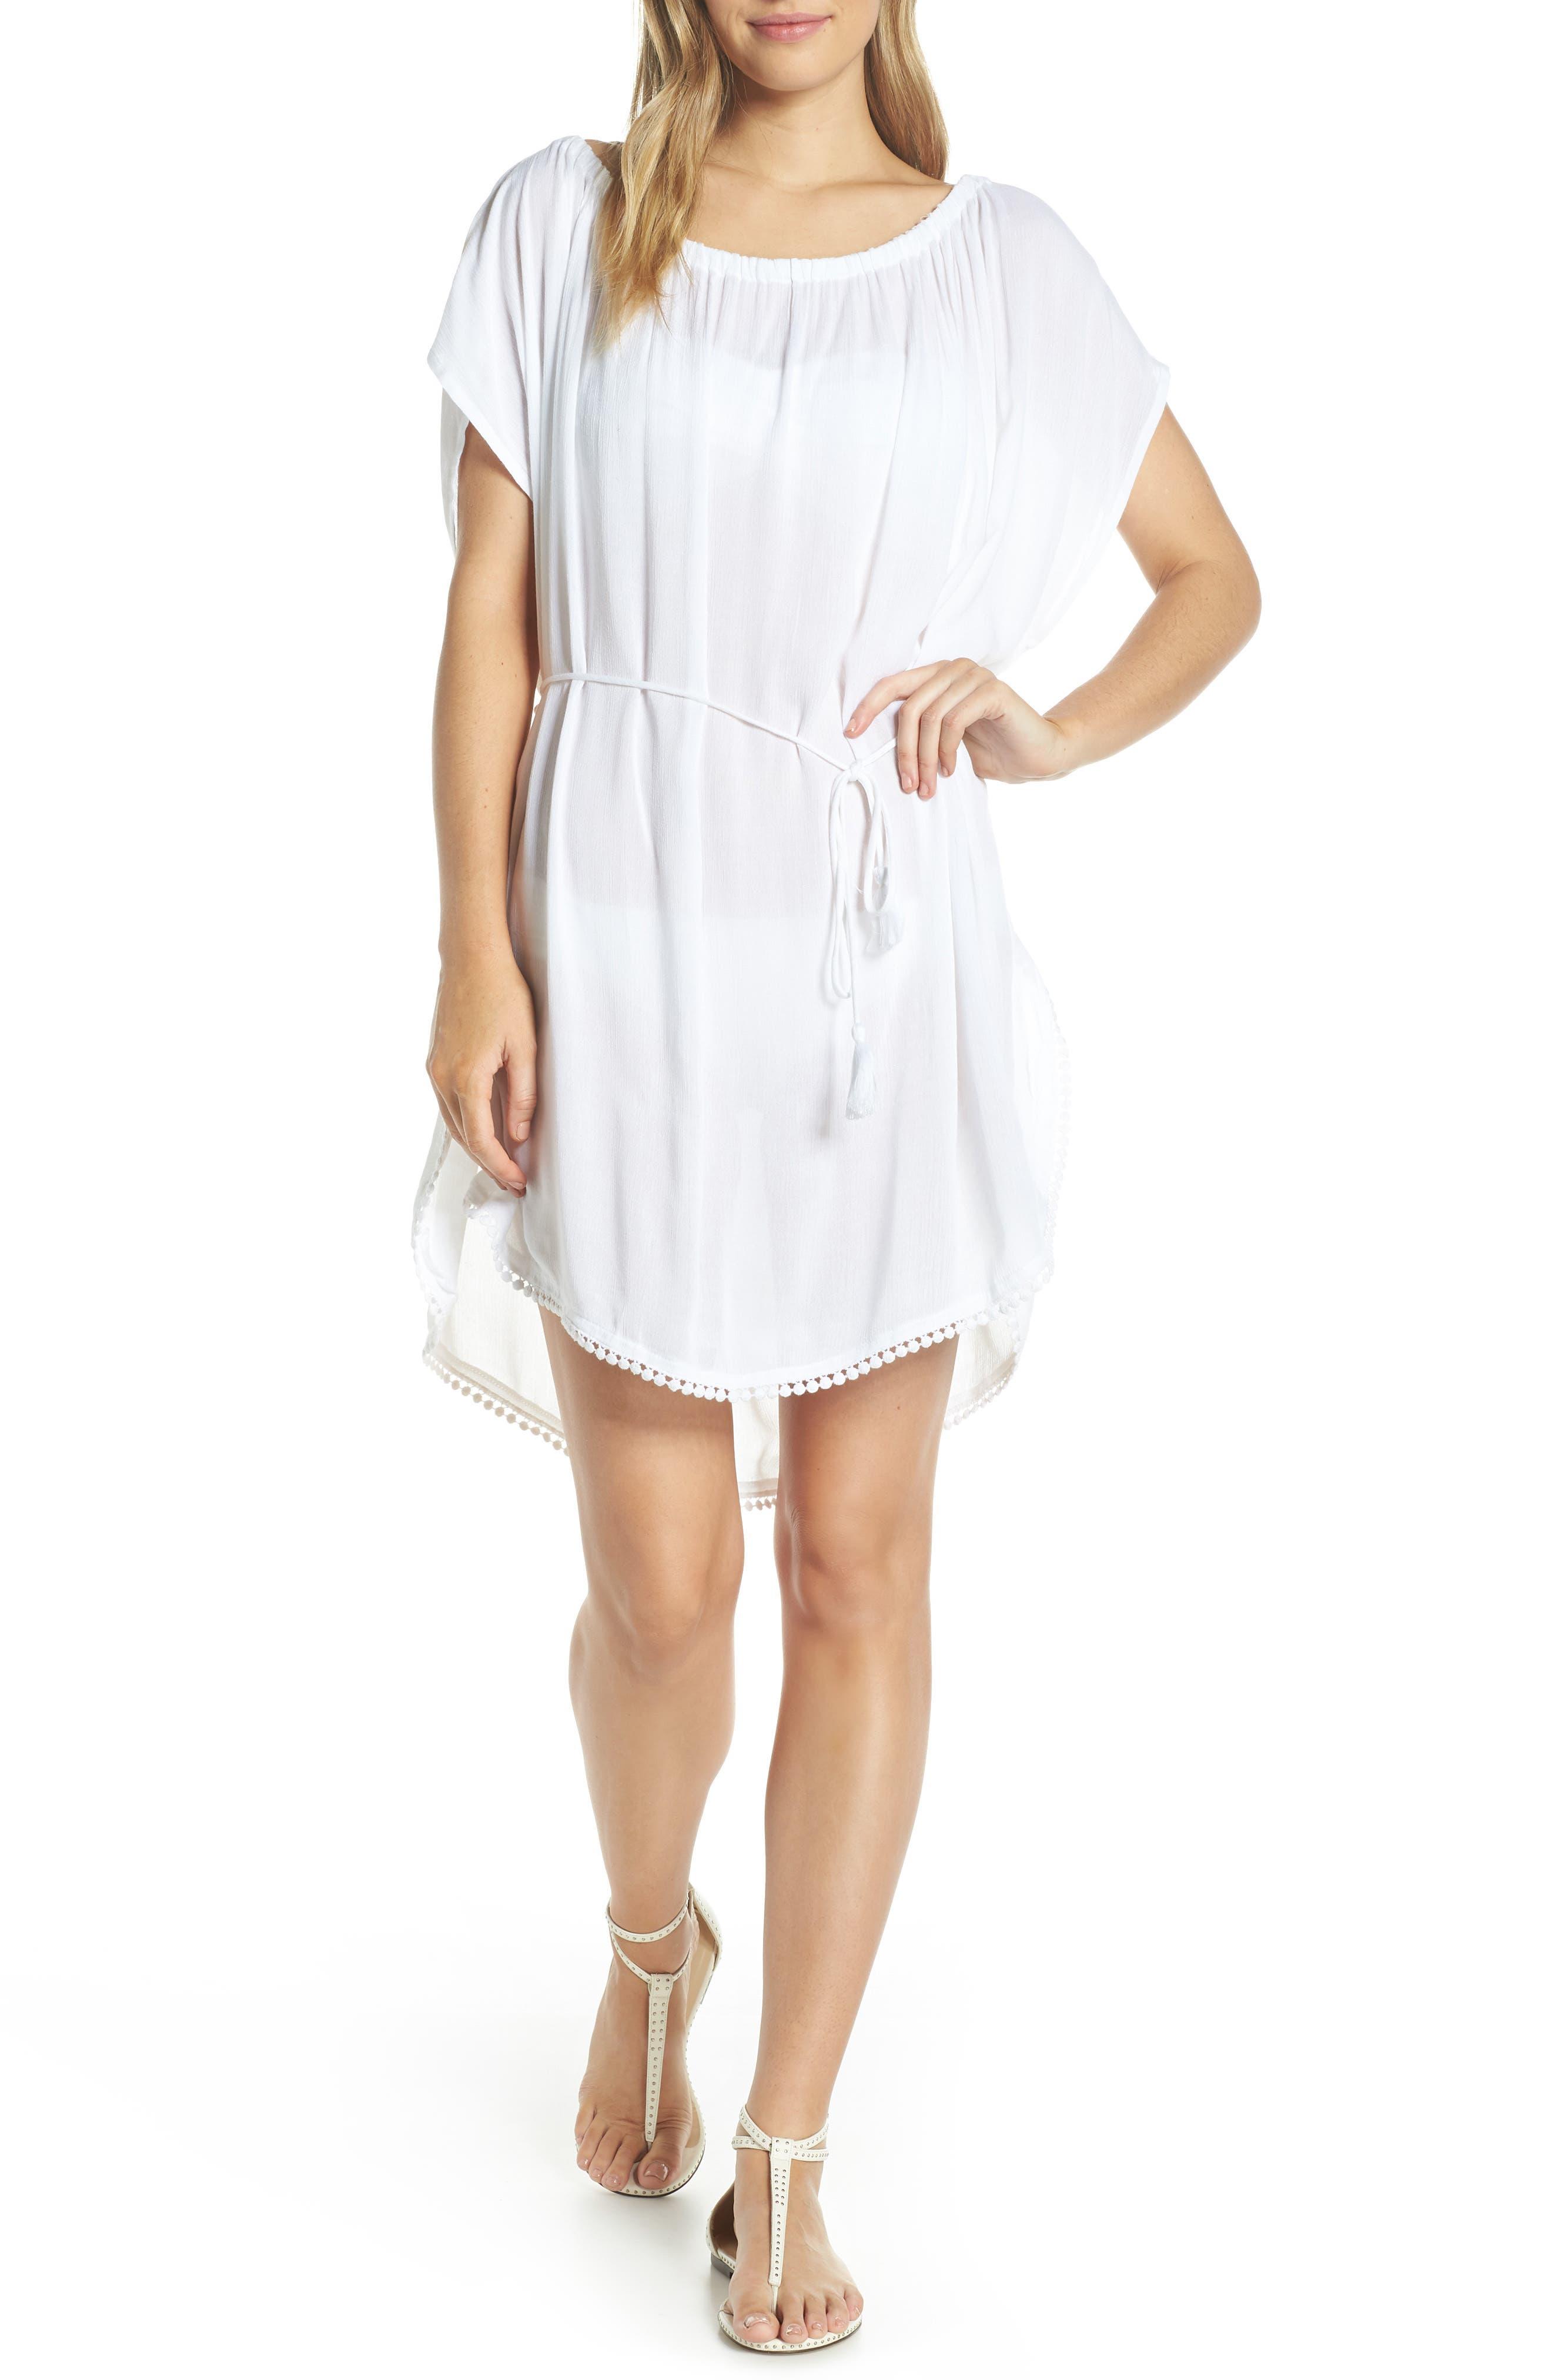 ECHO, Seaside Cover-Up Dress, Main thumbnail 1, color, WHITE